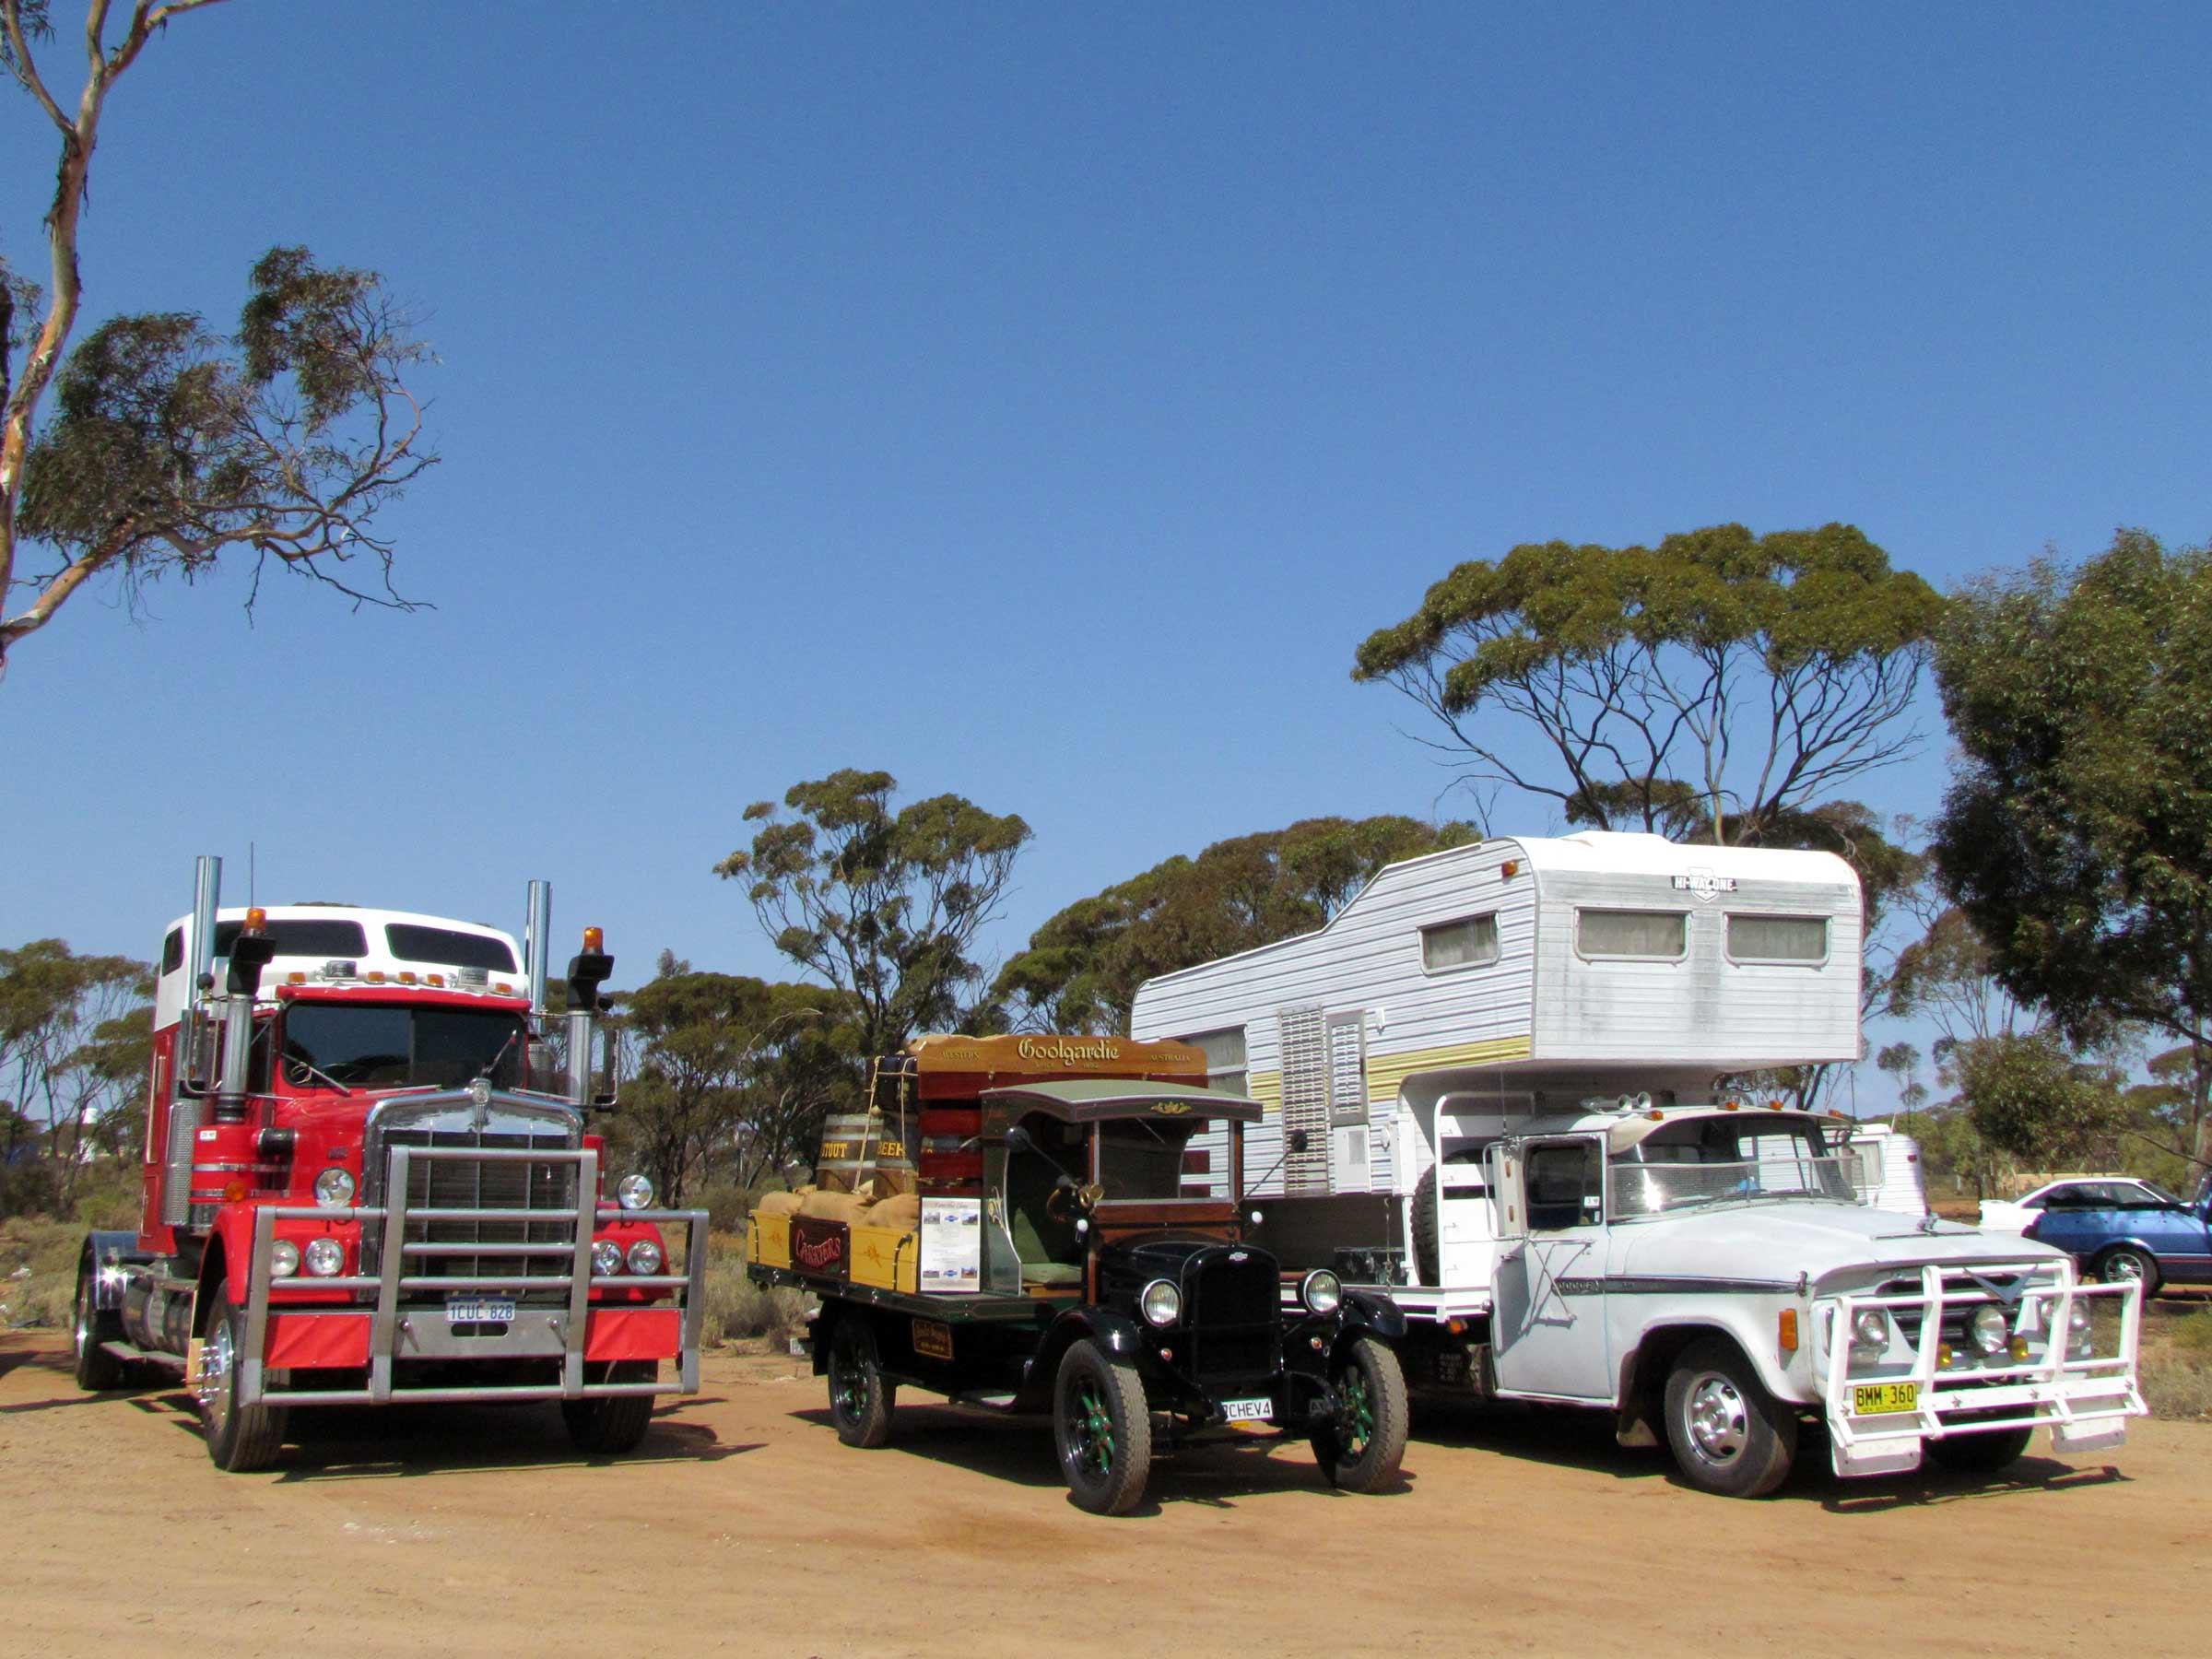 Vintage vehicles truck show